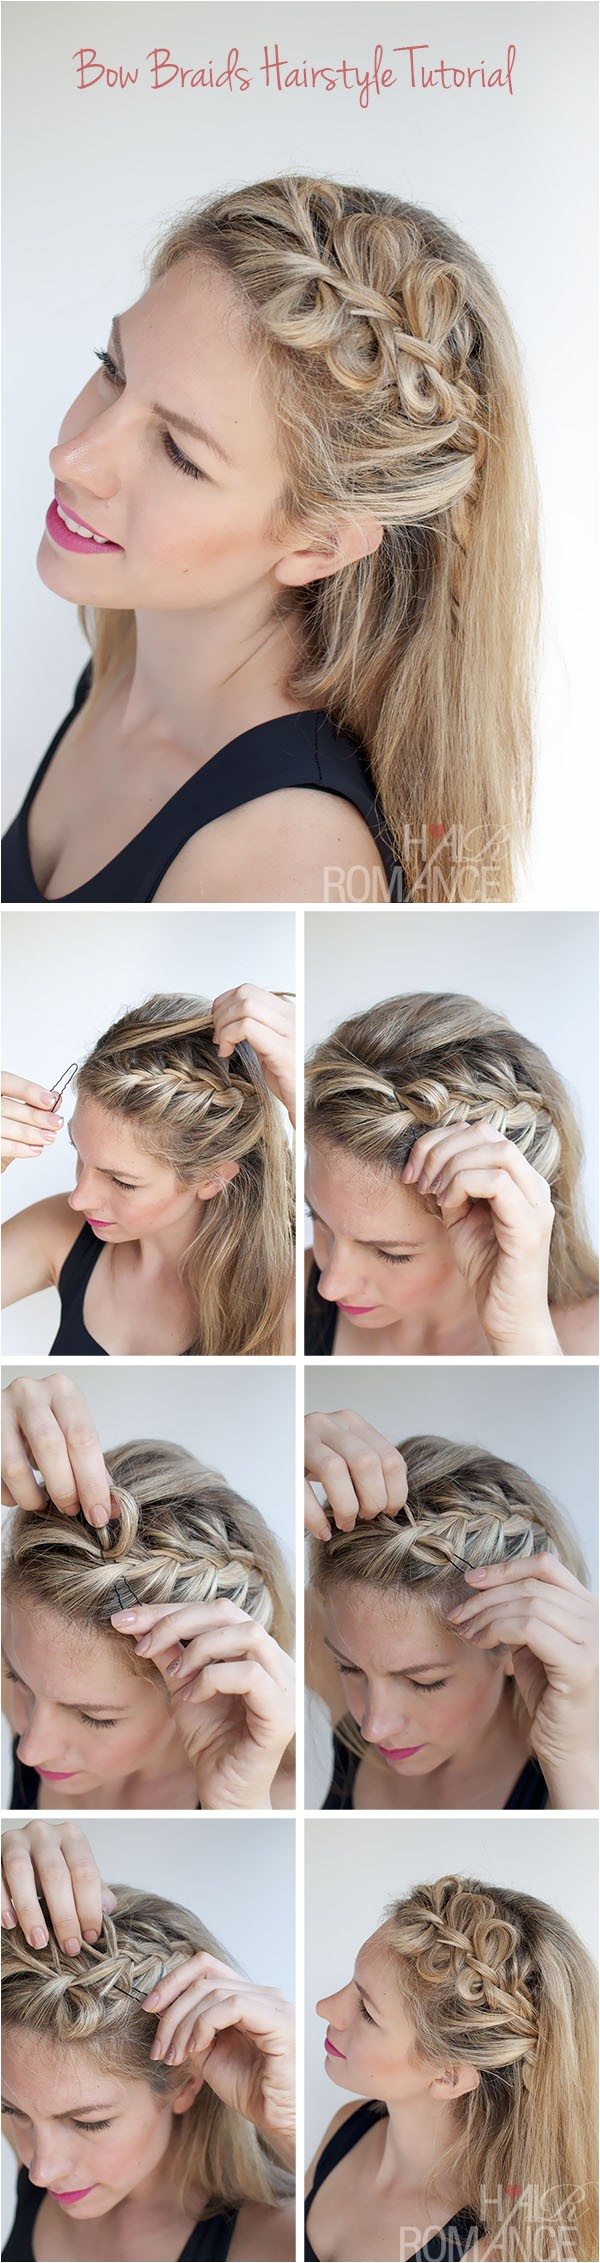 bow braids hairstyle tutorial